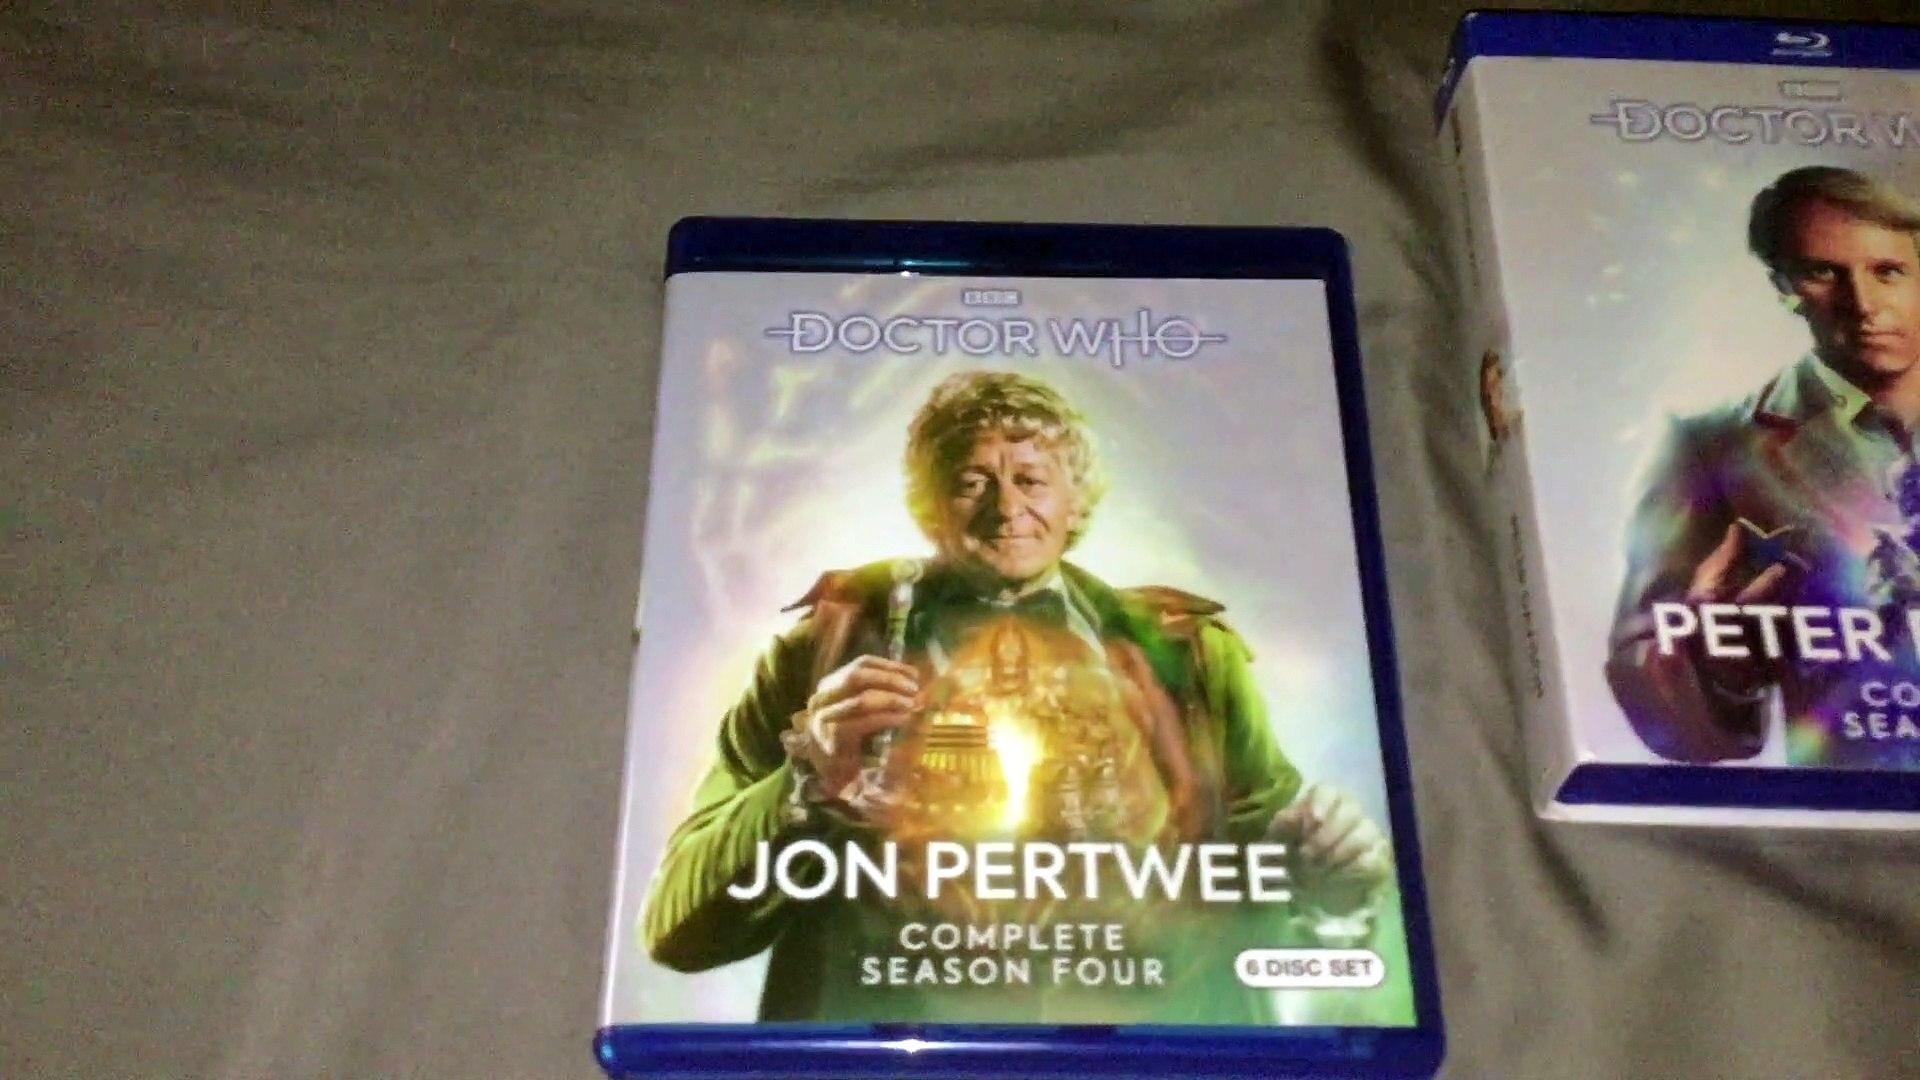 Doctor Who John Pertwee Season 4 Season 10 Blu Ray Unboxing